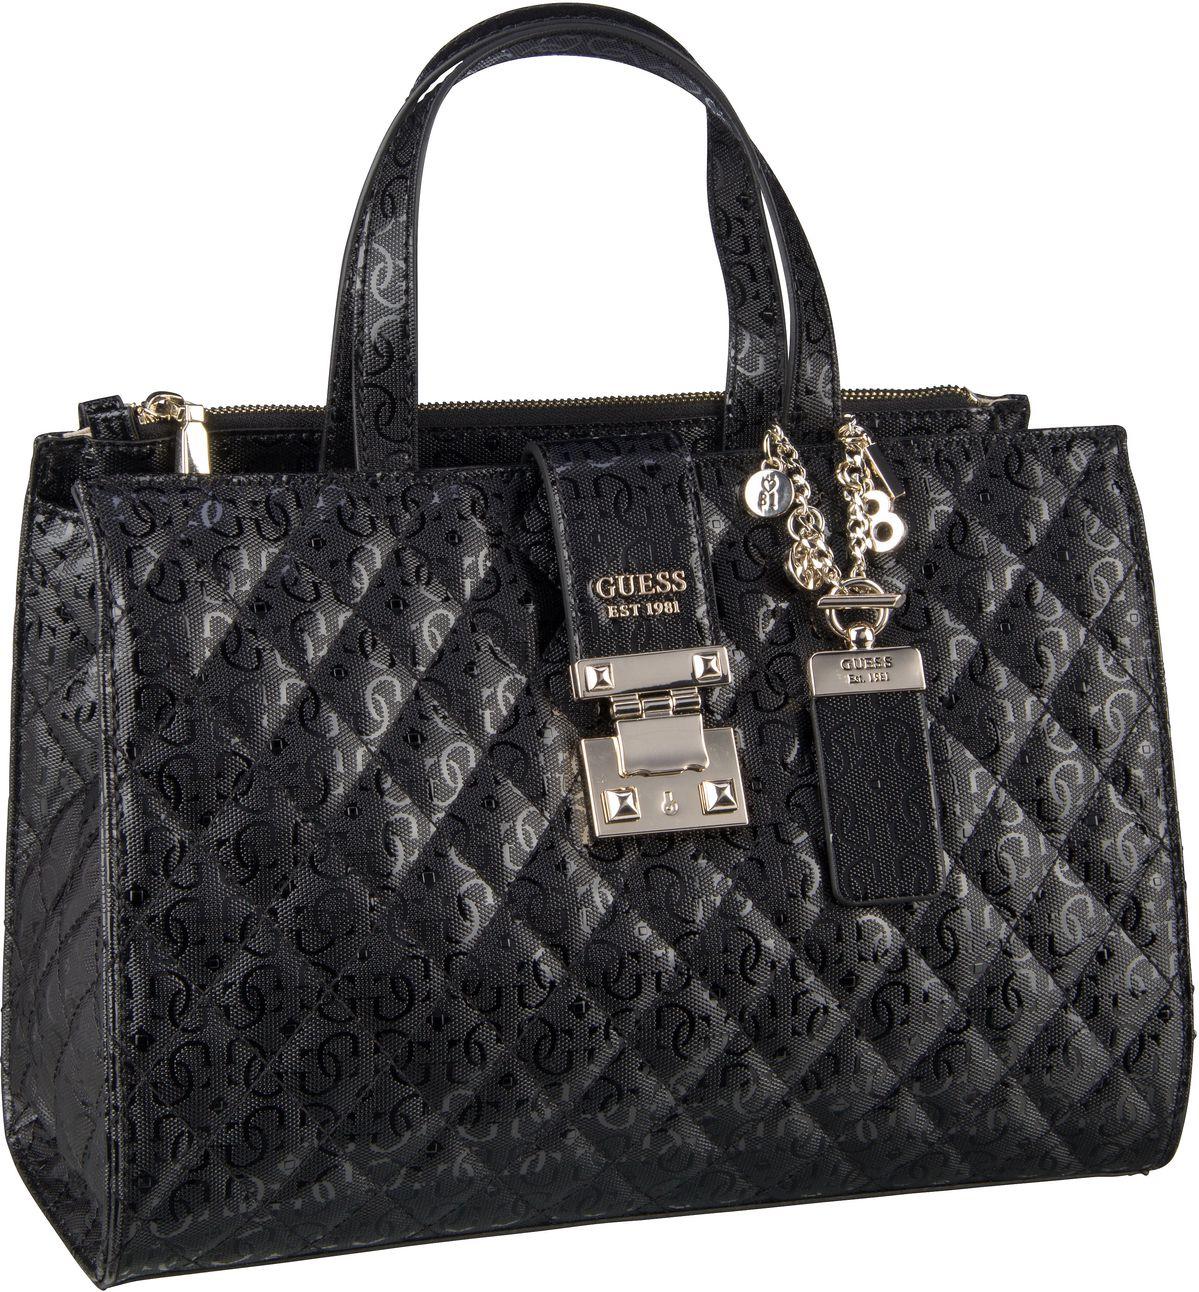 Handtasche Tiggy Society Satchel Black